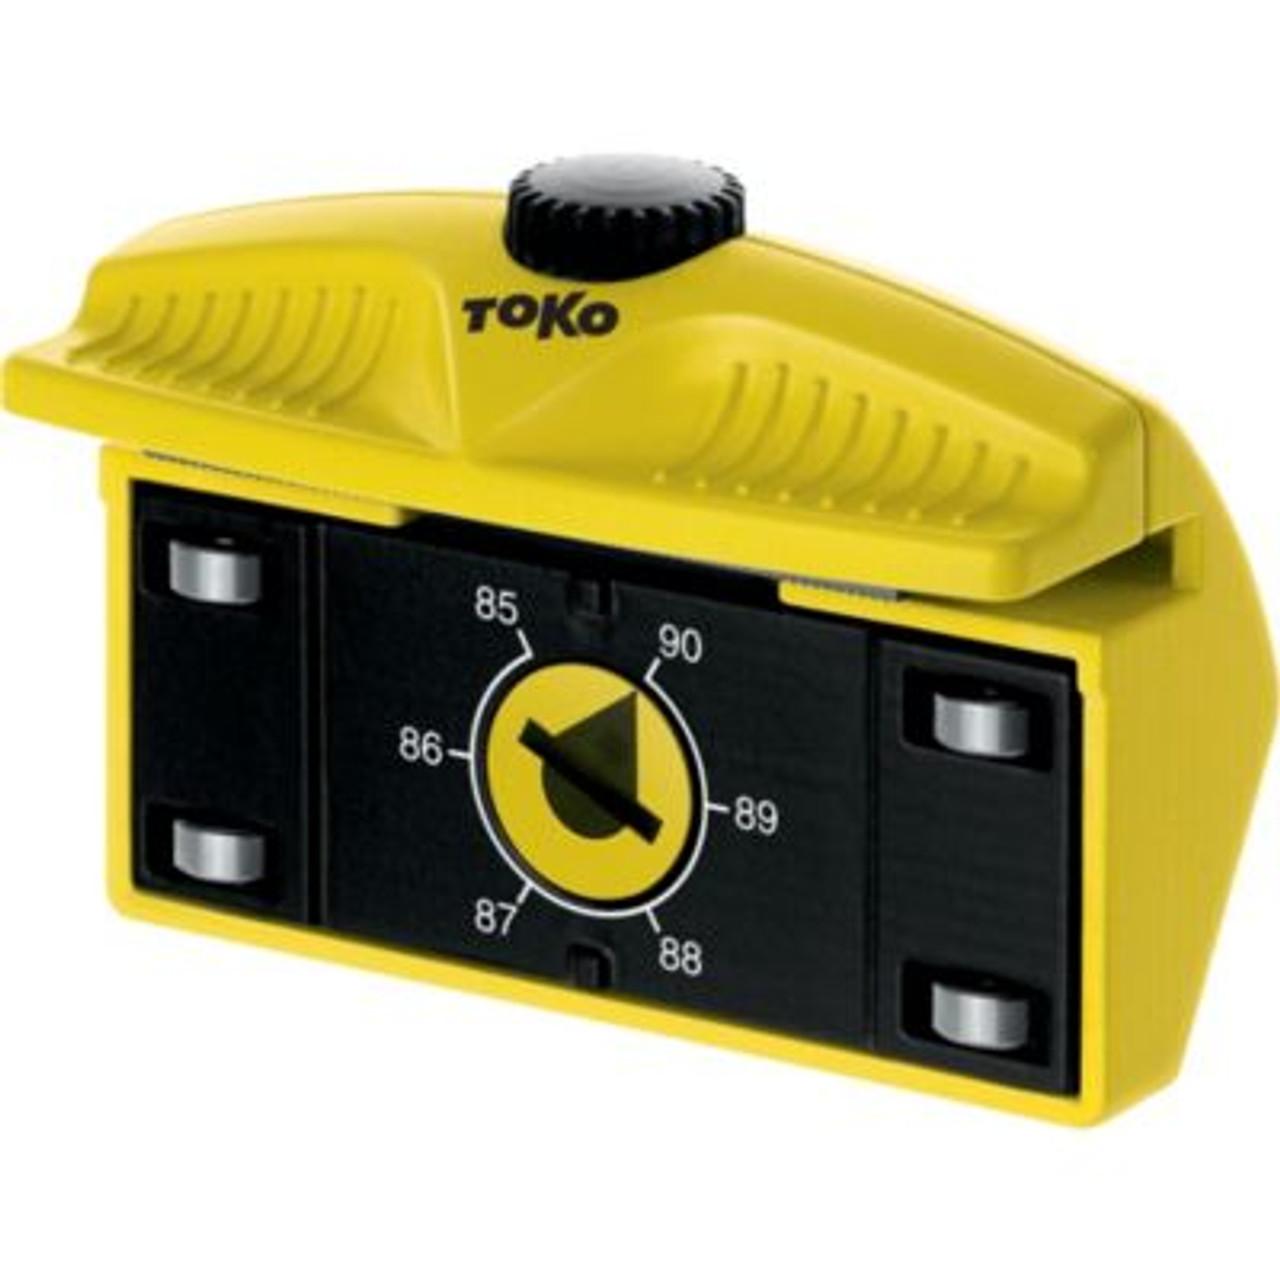 Toko Edge Tuner Pro Side Edge Guide